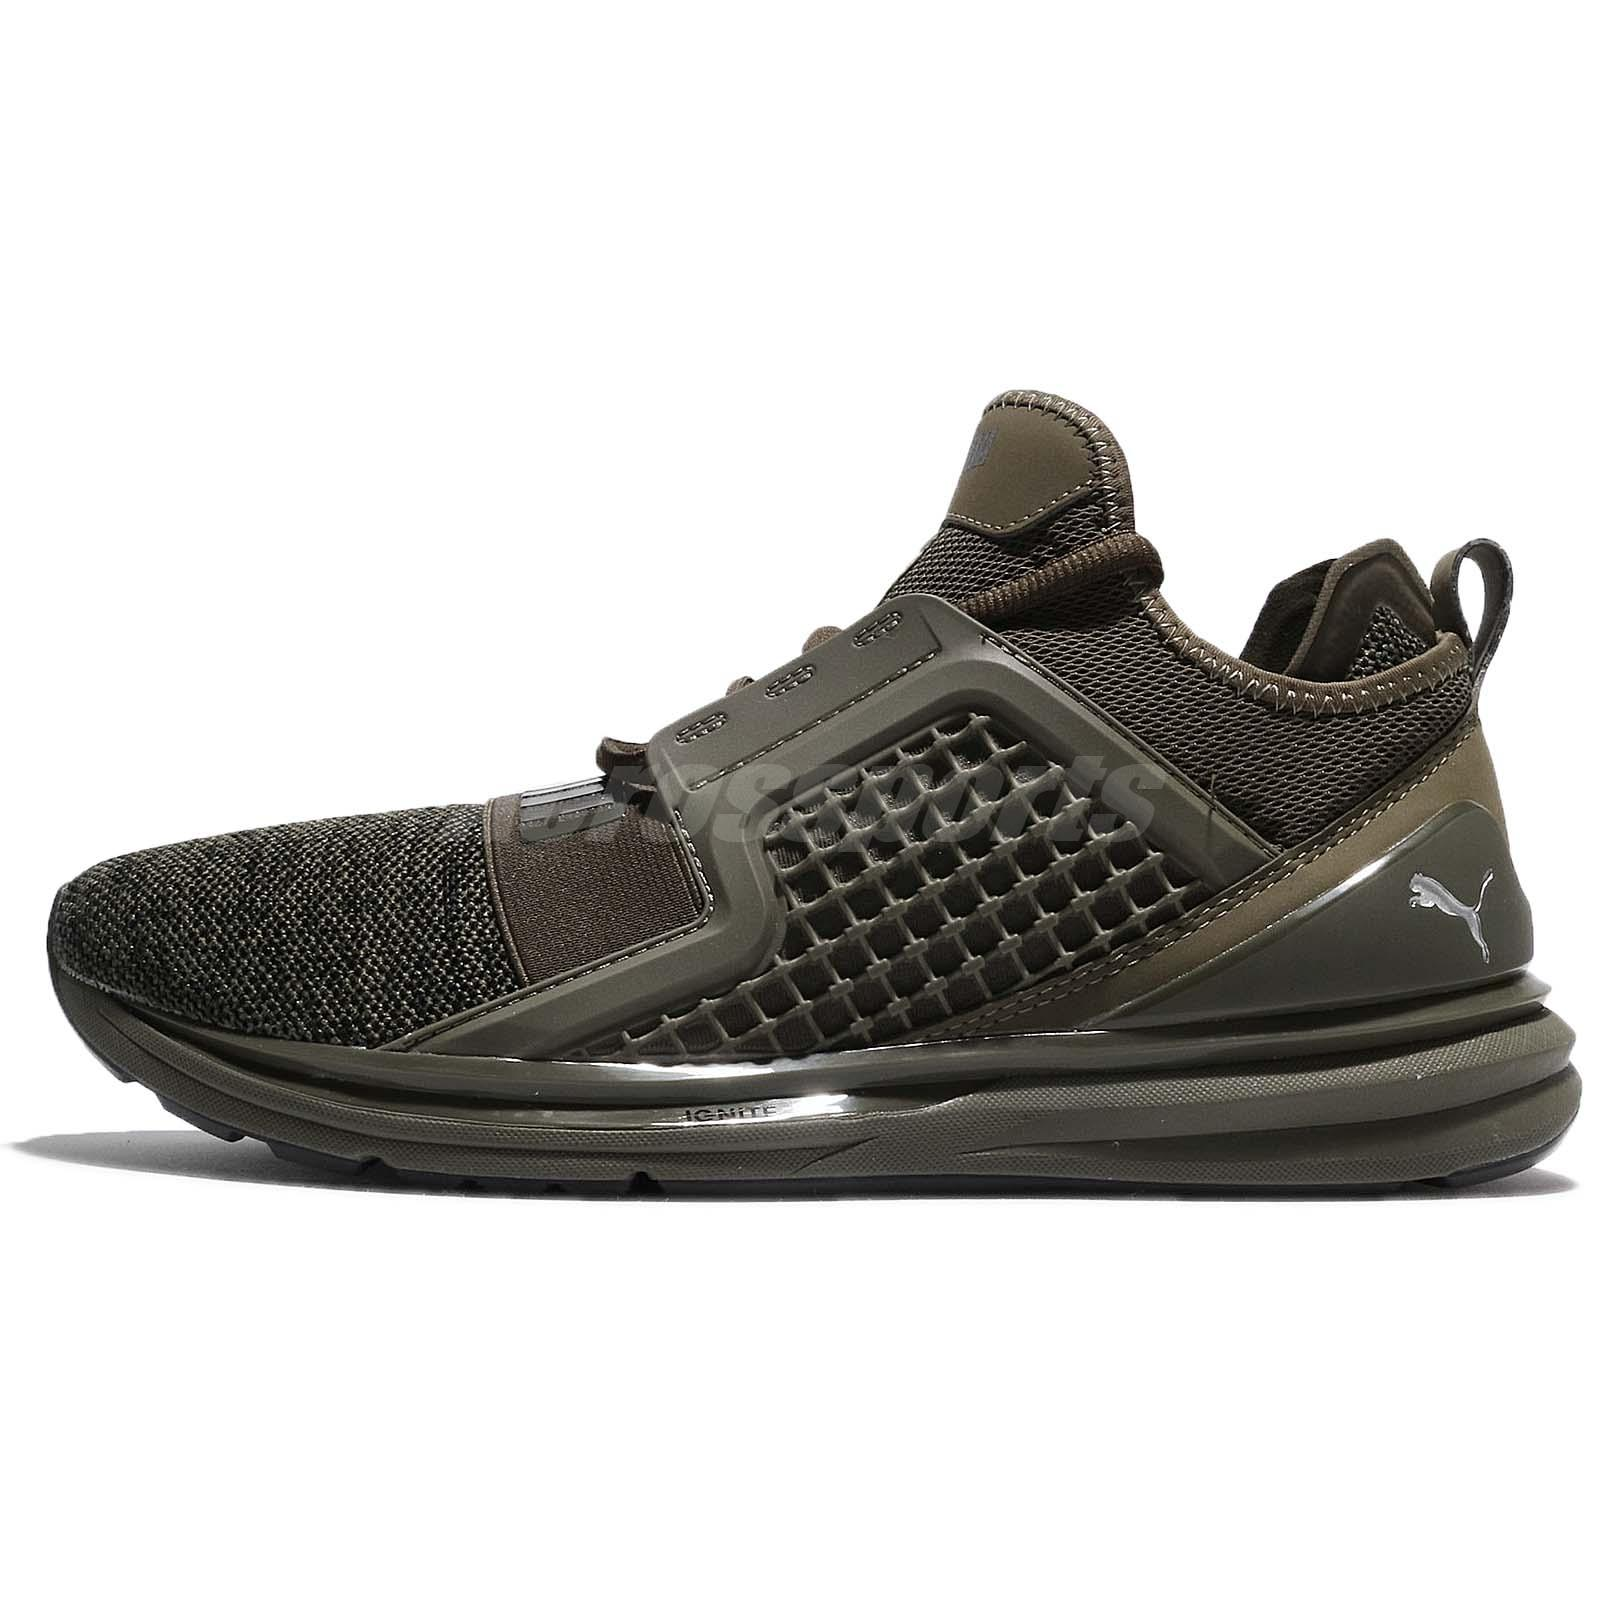 b2019e1c2618 Puma Ignite Limitless Knit Olive Night Black Men Running Shoes Sneaker  189987-03